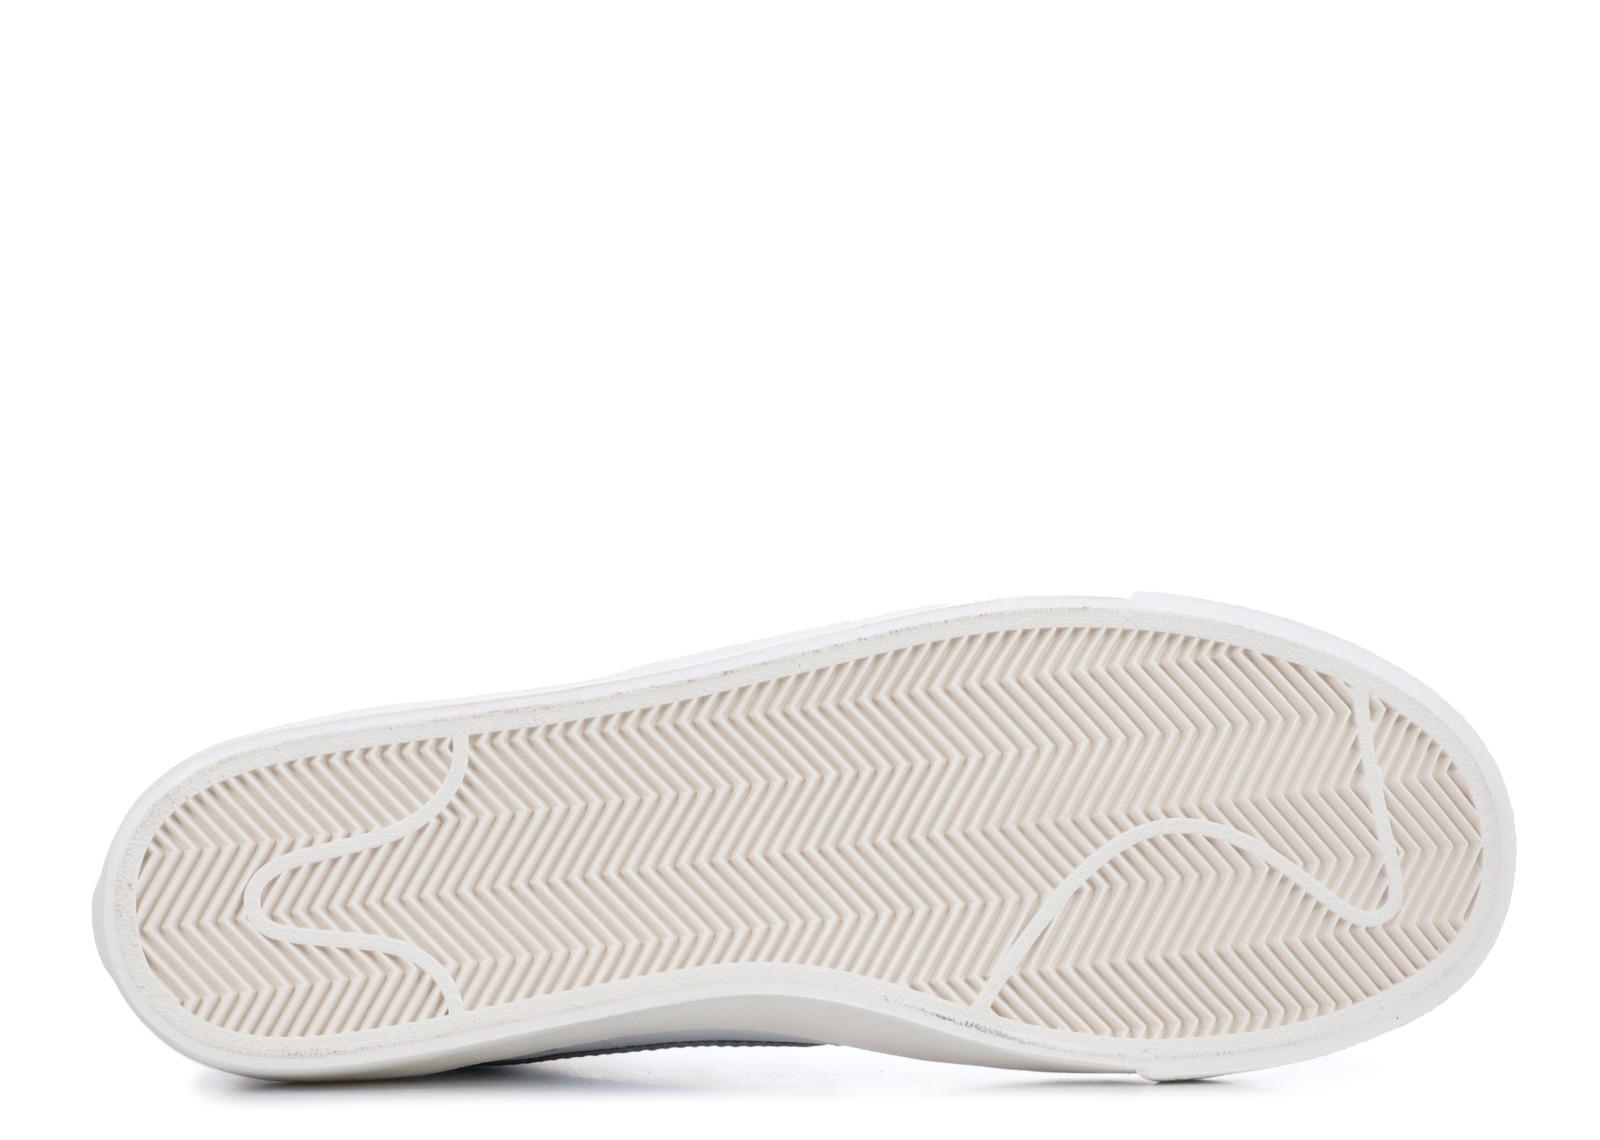 88d1c209a133 Nike Blazer Mid 77 Lucid Green - 4